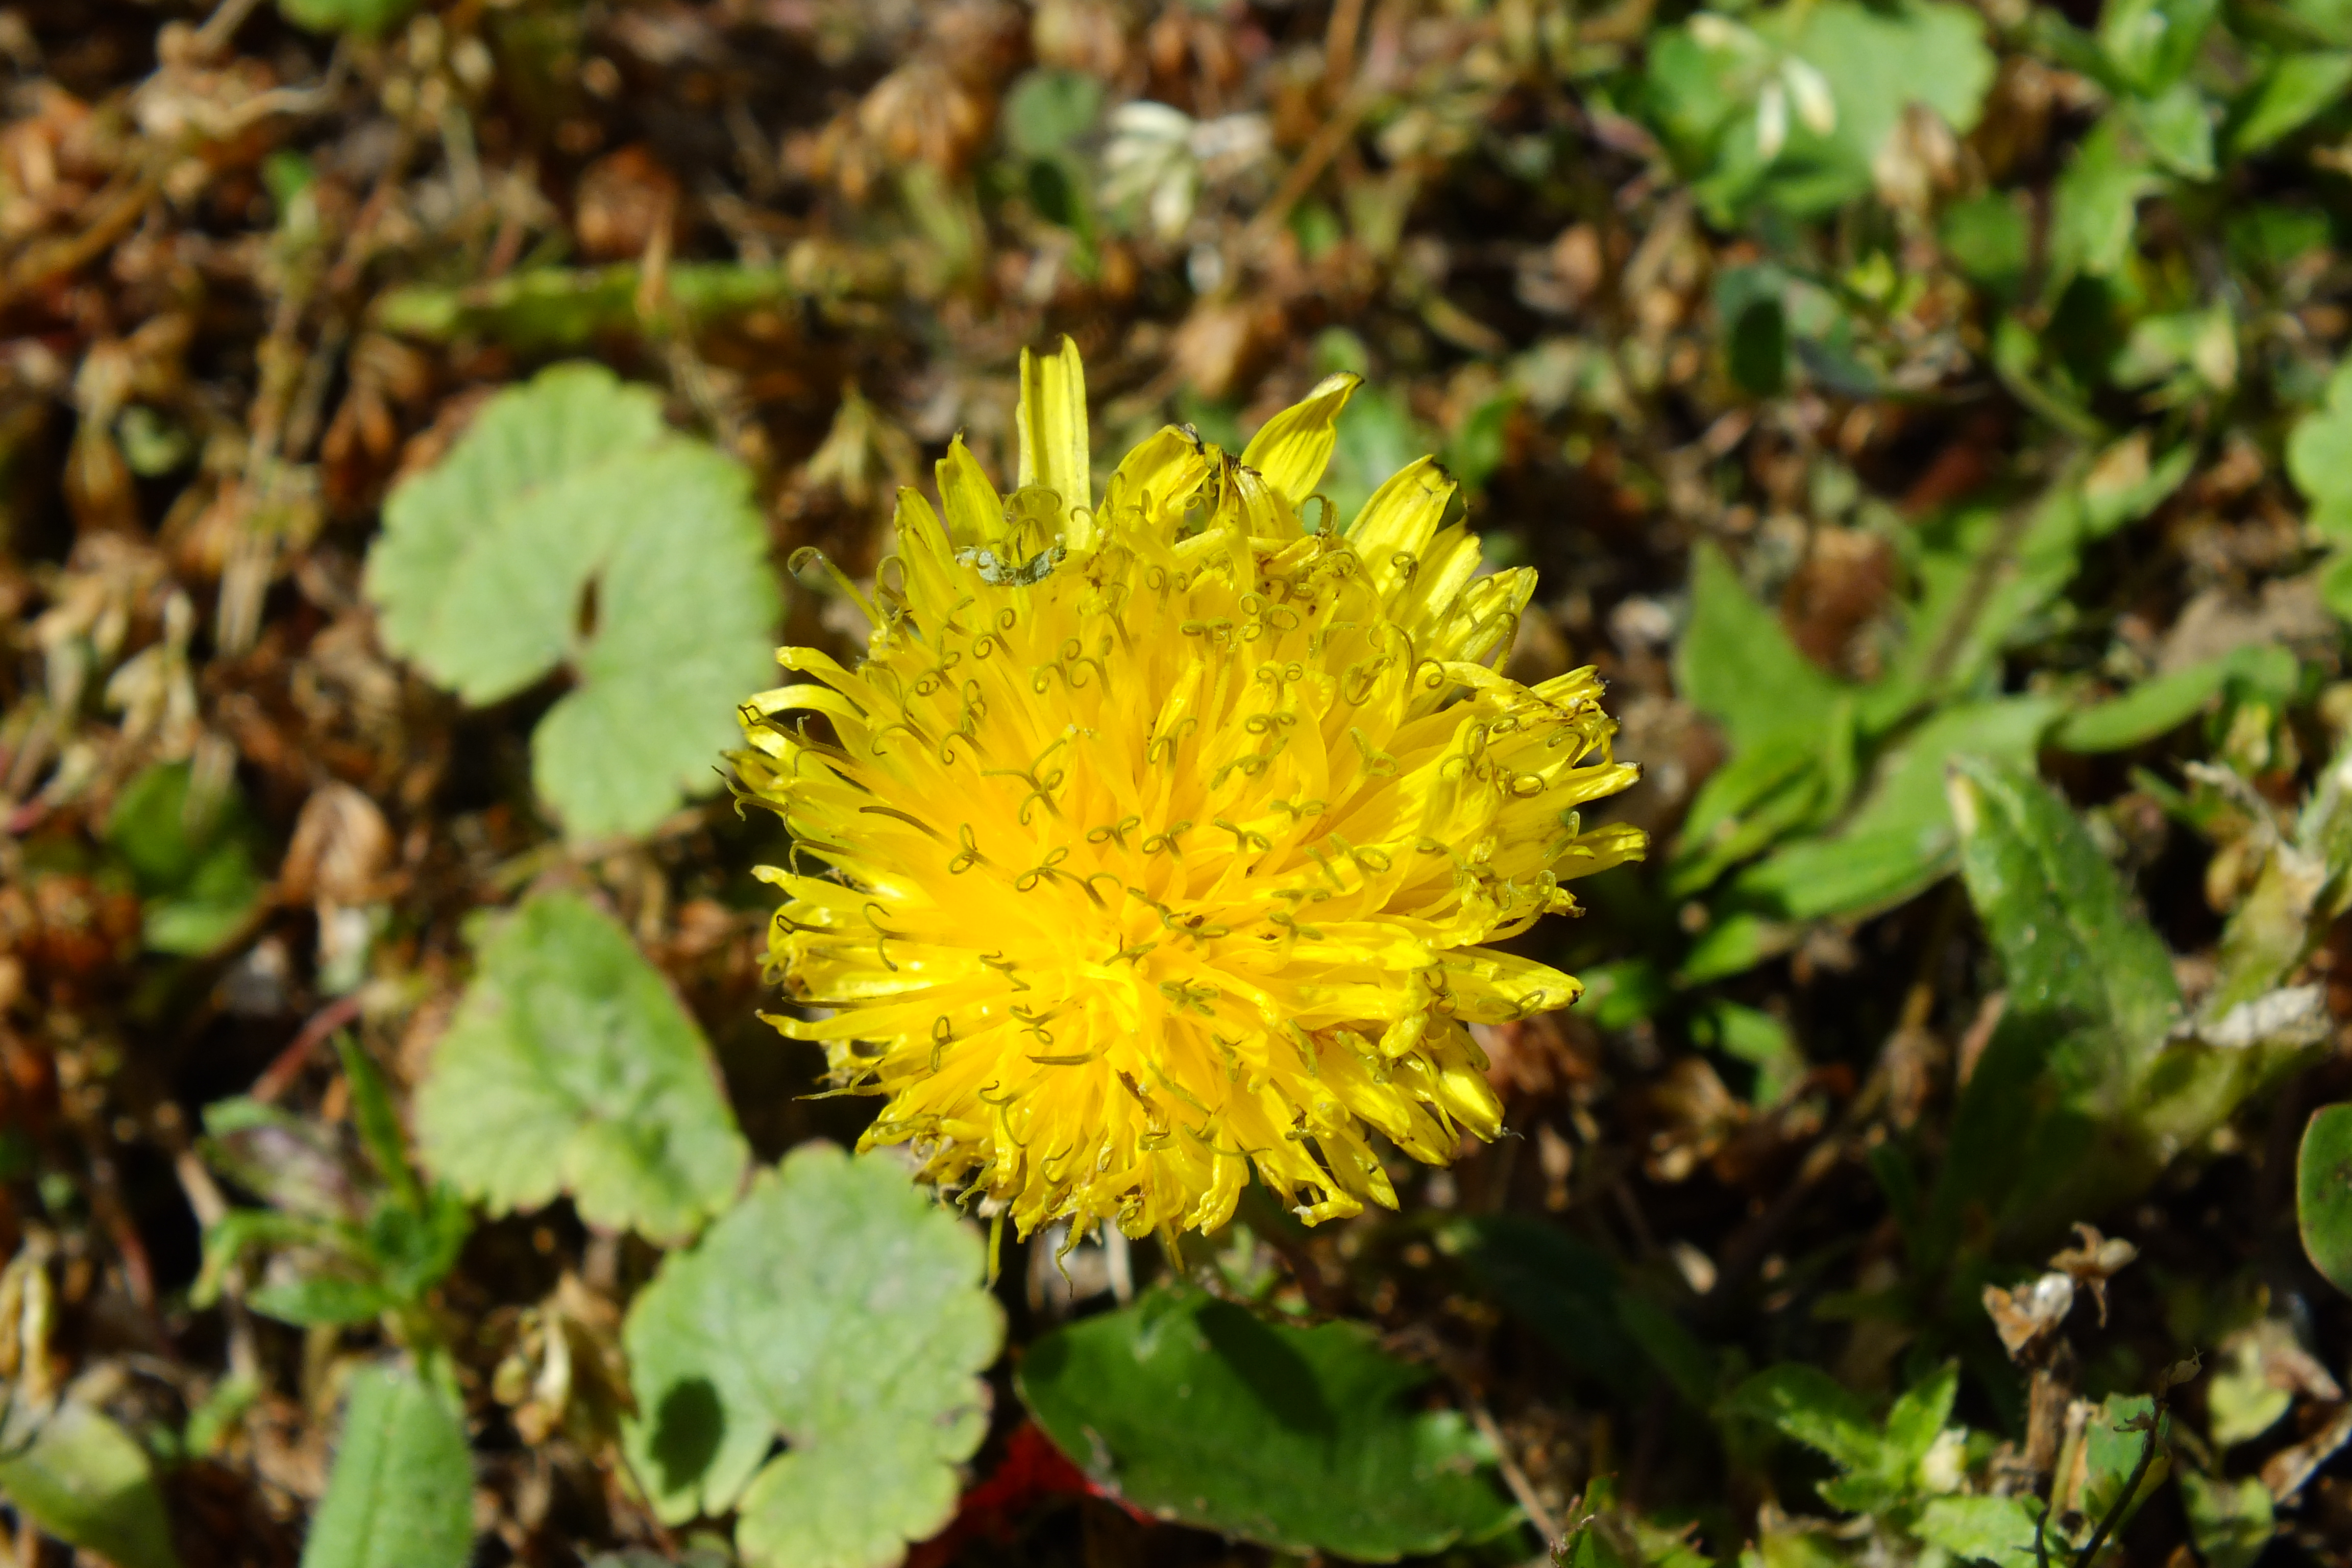 Yellow Flower, Bloom, Flower, Yellow, HQ Photo